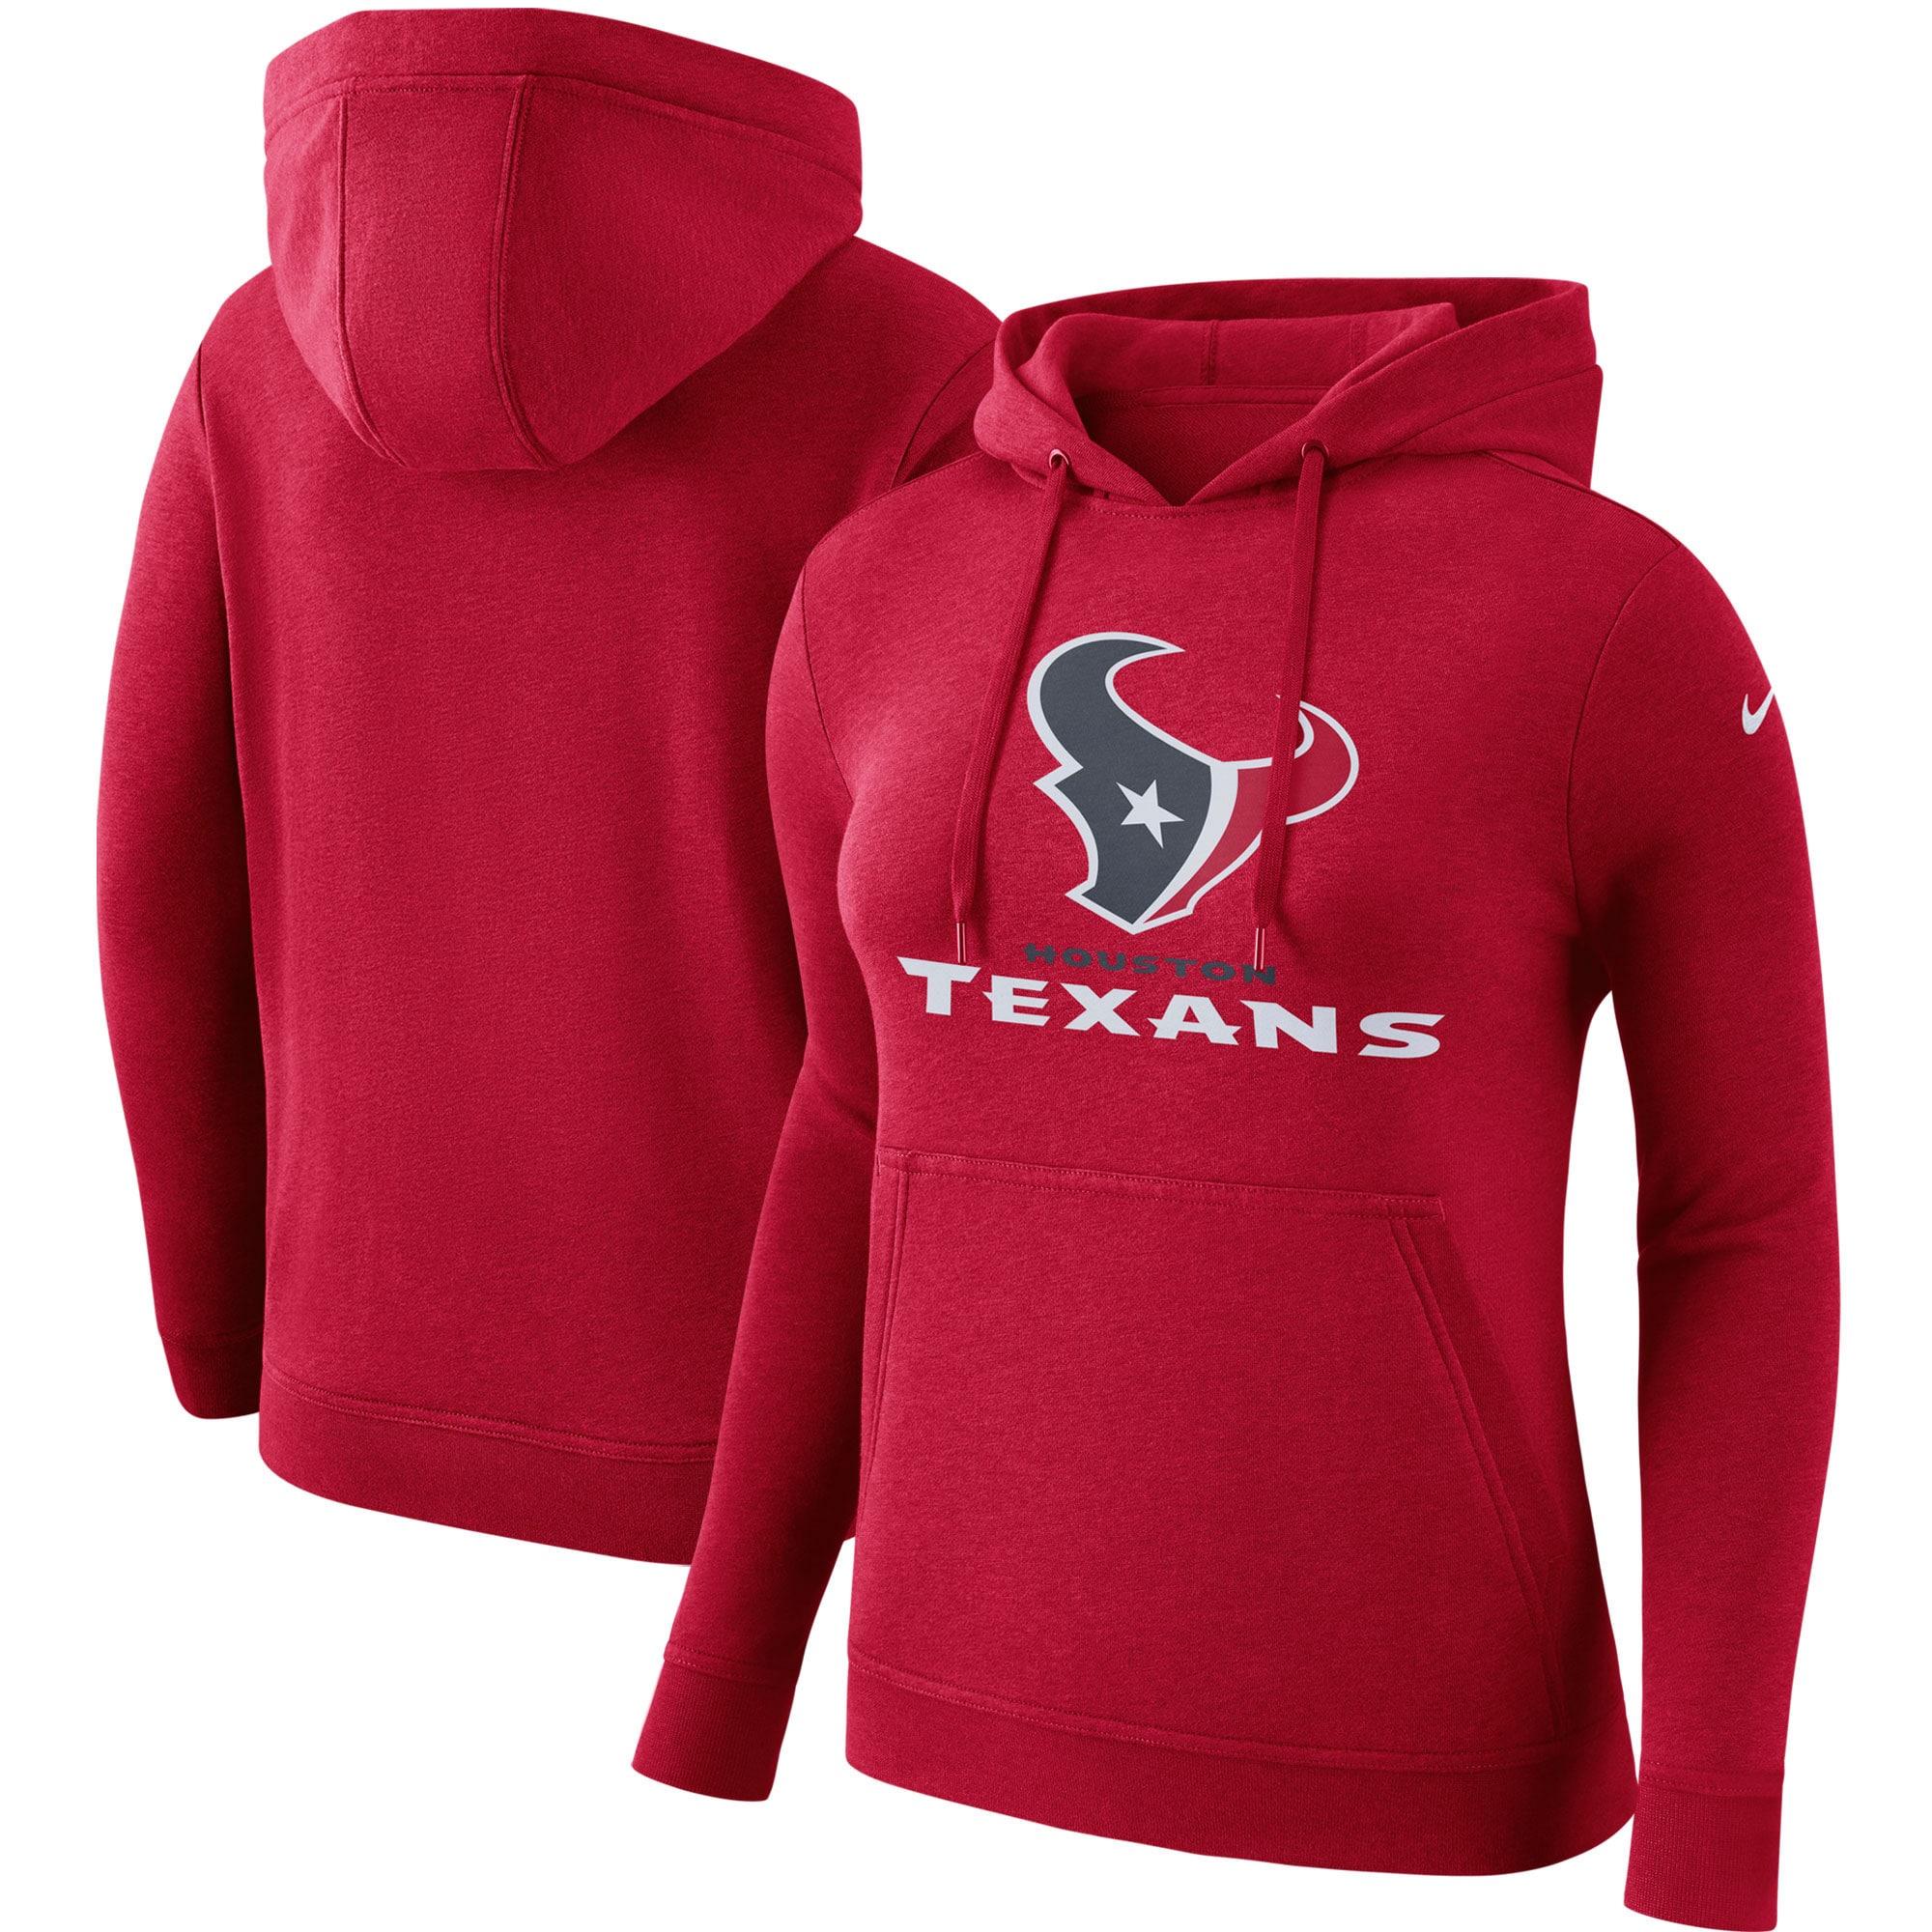 Houston Texans Nike Women's Club Tri-Blend Pullover Hoodie - Red